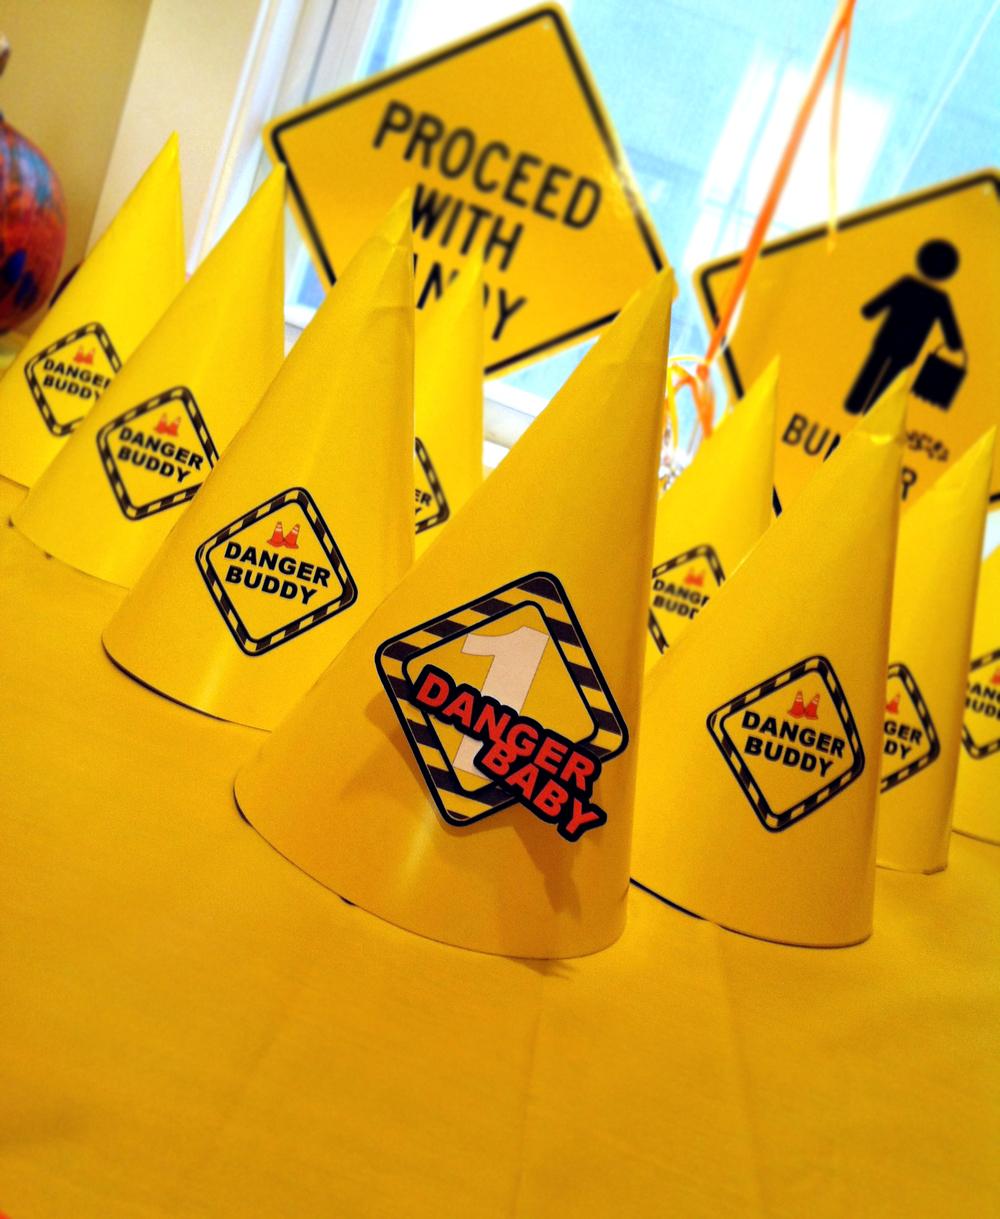 BSAZ CREATES   DANGER BABY CUSTOM BIRTHDAY   PARTY HATS